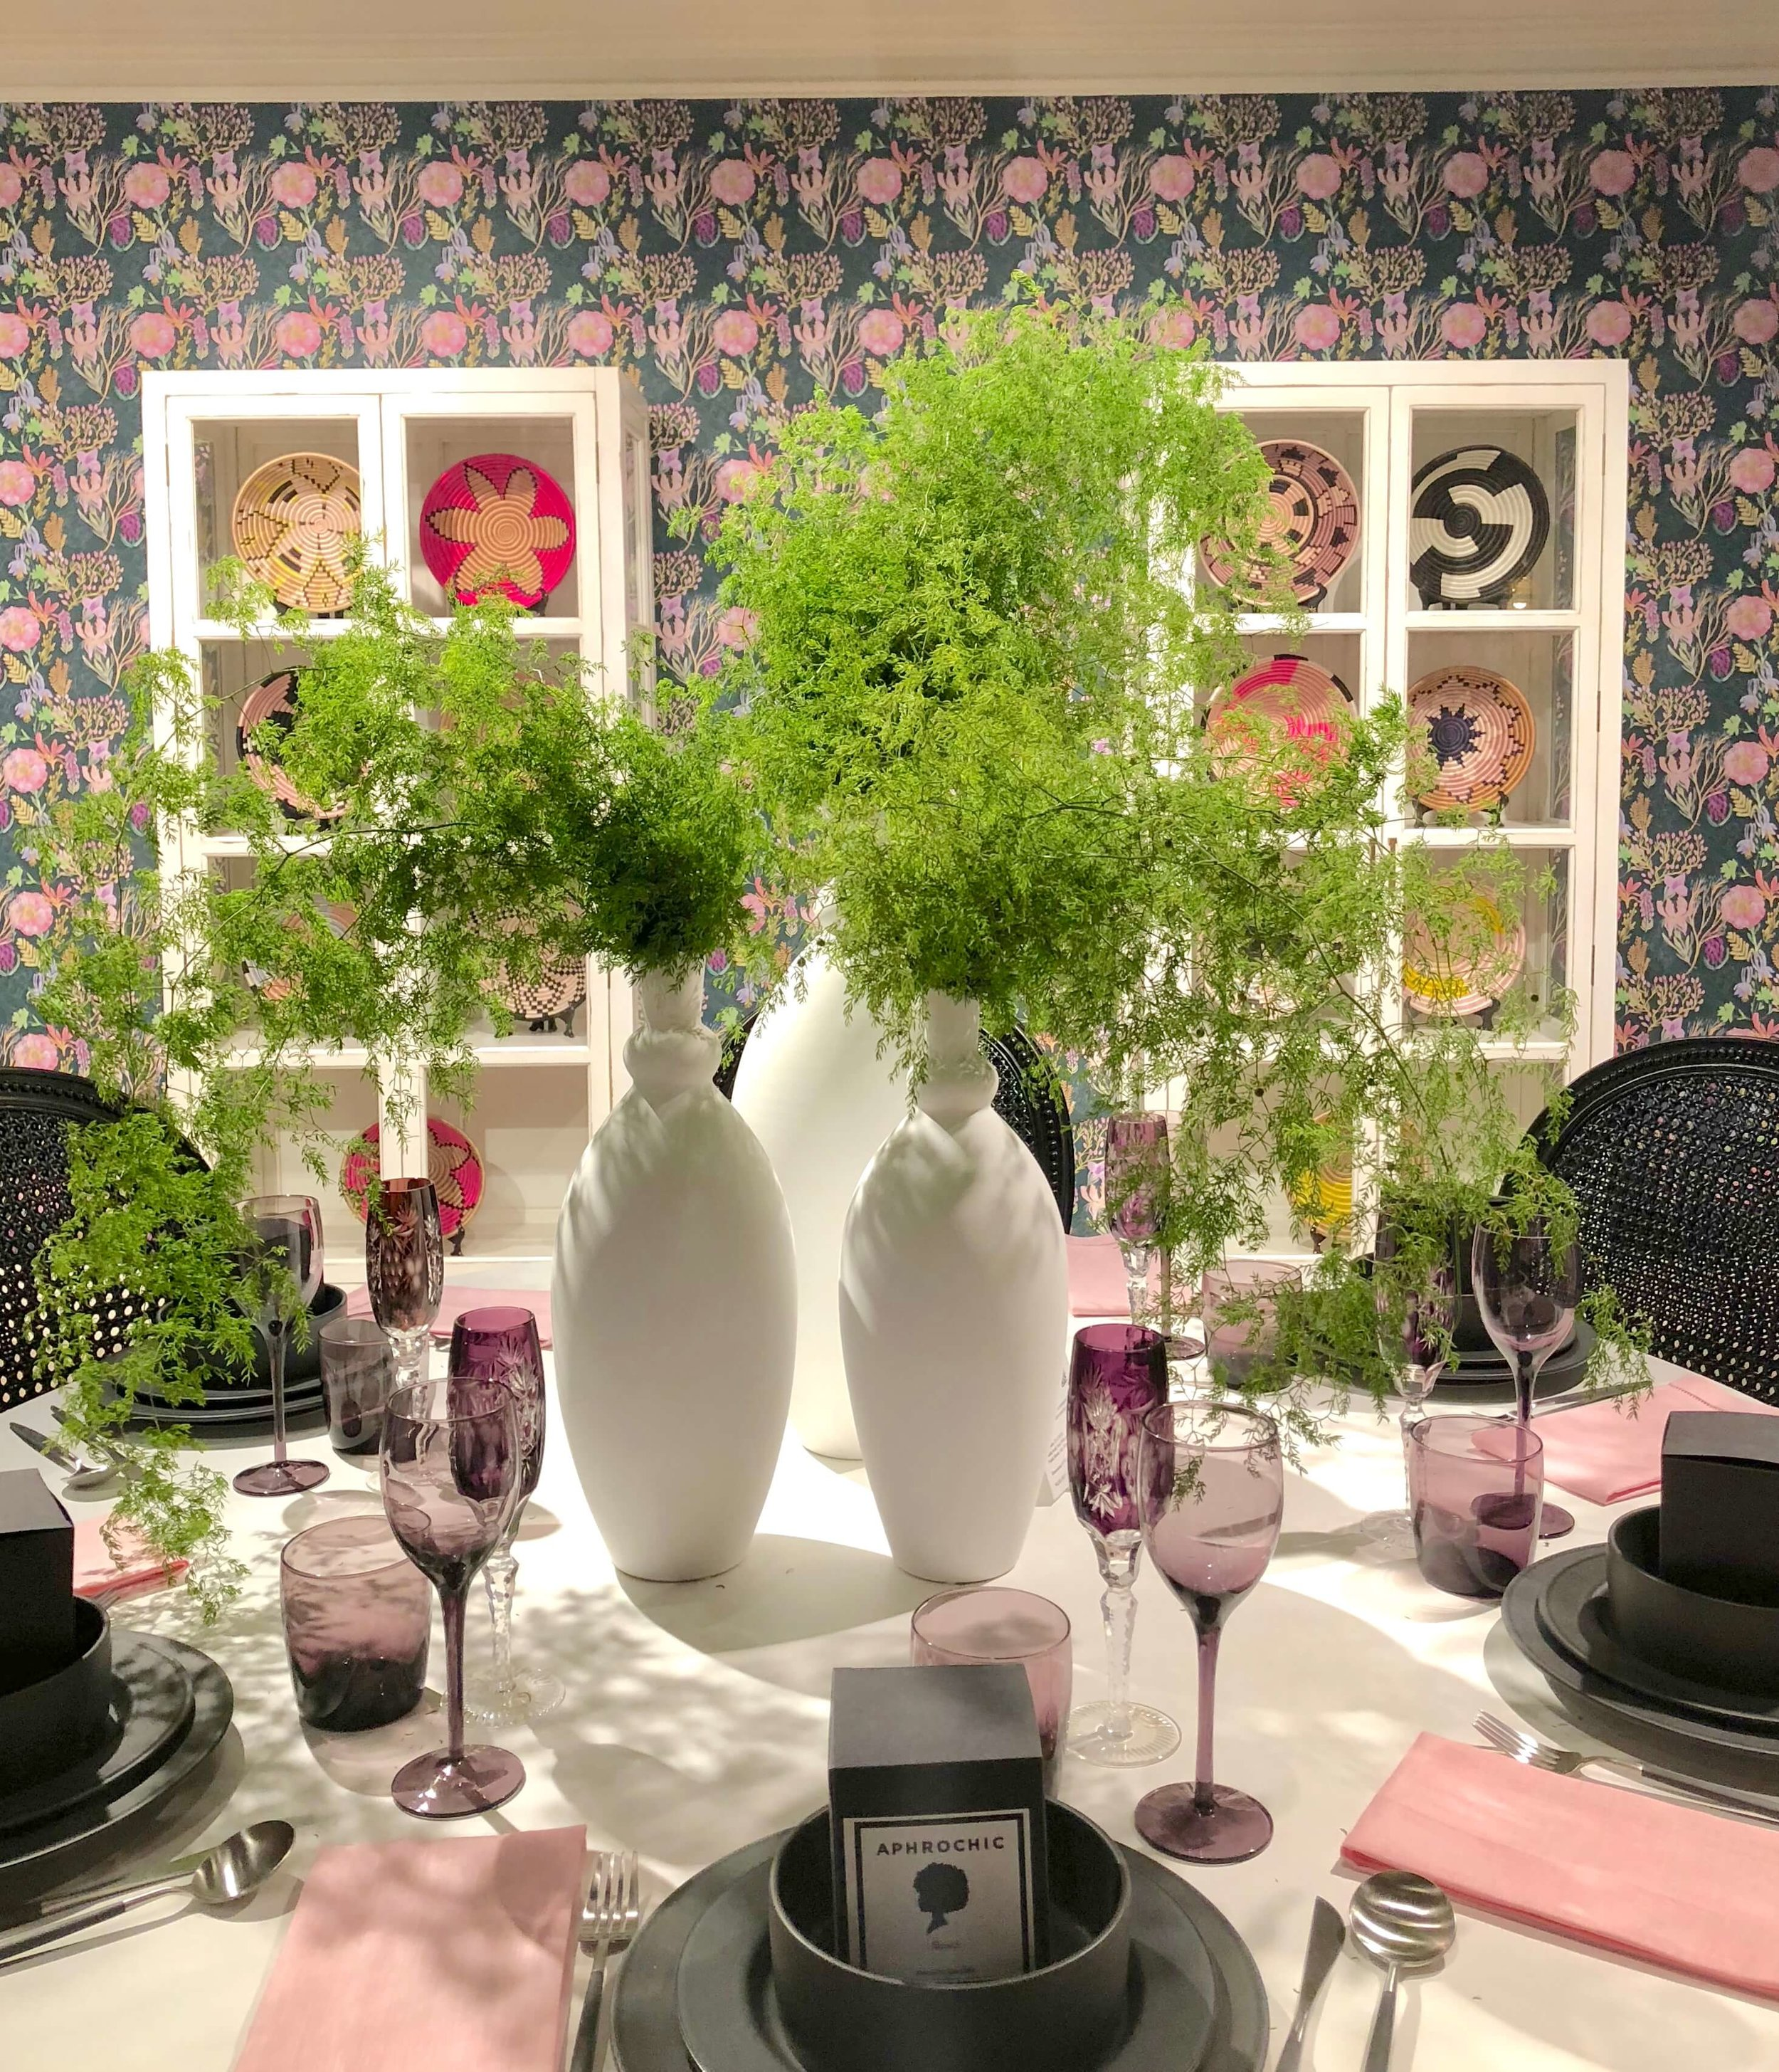 Dining room designed by Aphro Chic for Alden Parkes Showroom #hpmkt #diningroomideas #diningroom